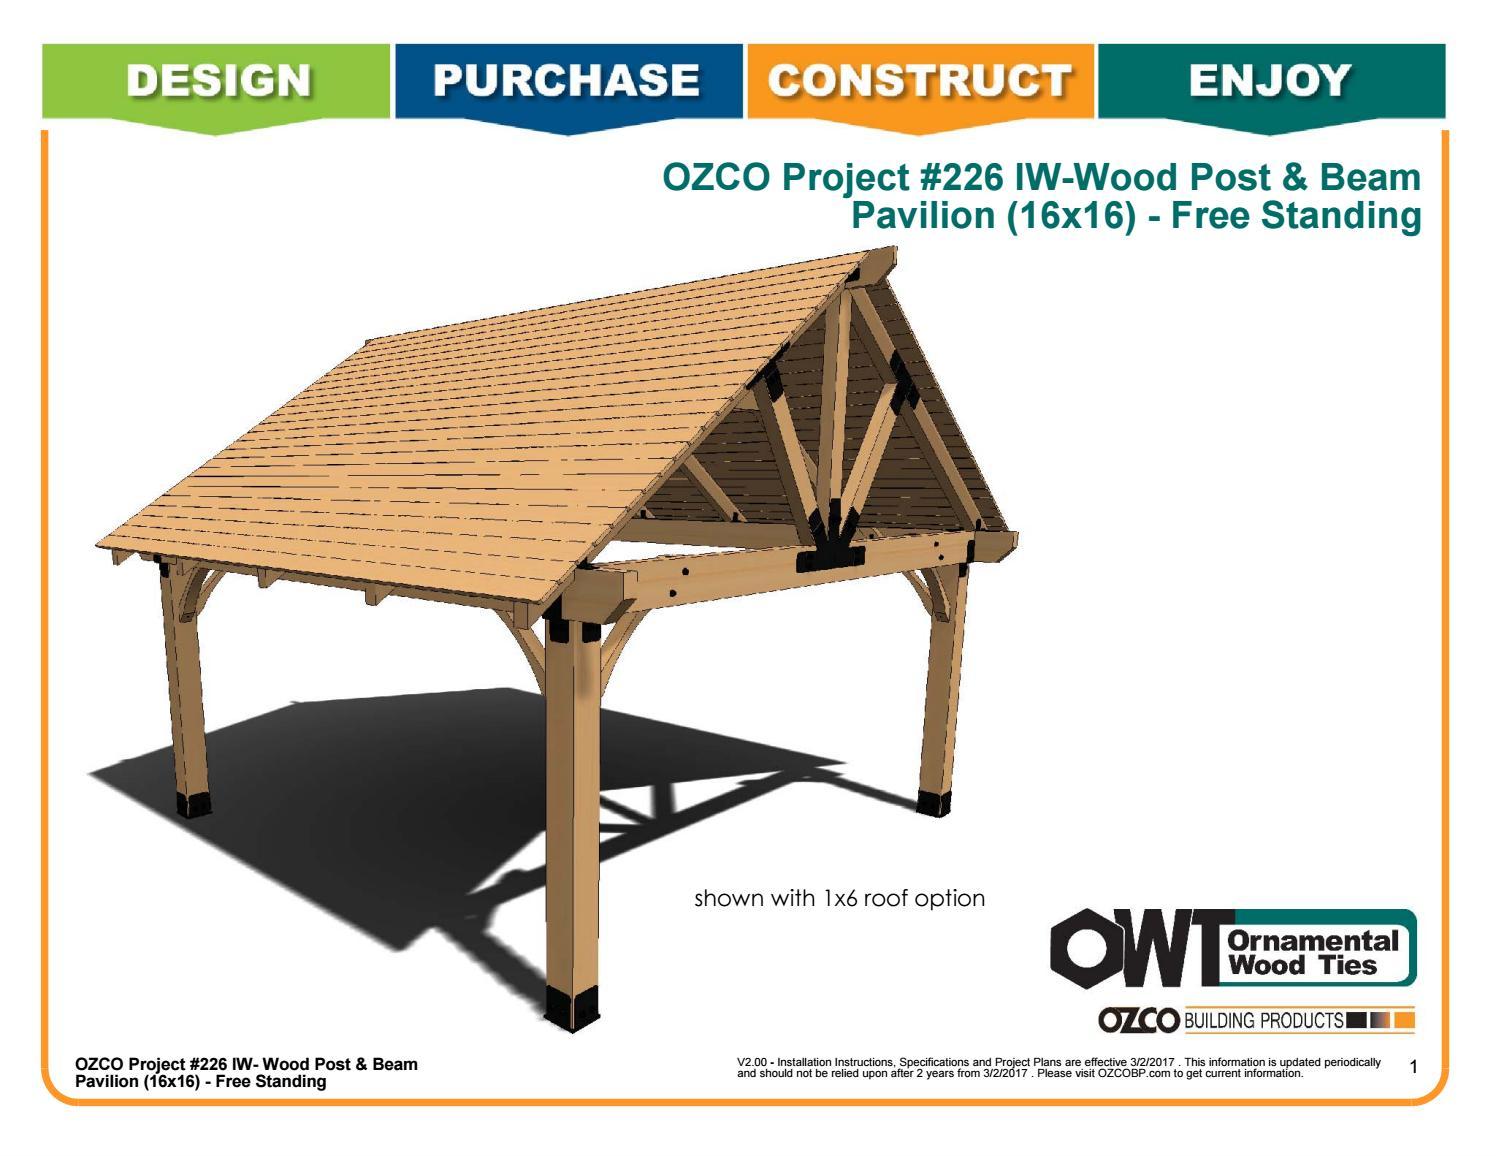 OZCO Project Wood Post & Beam Pavilion (16x16) #226 by OZCO